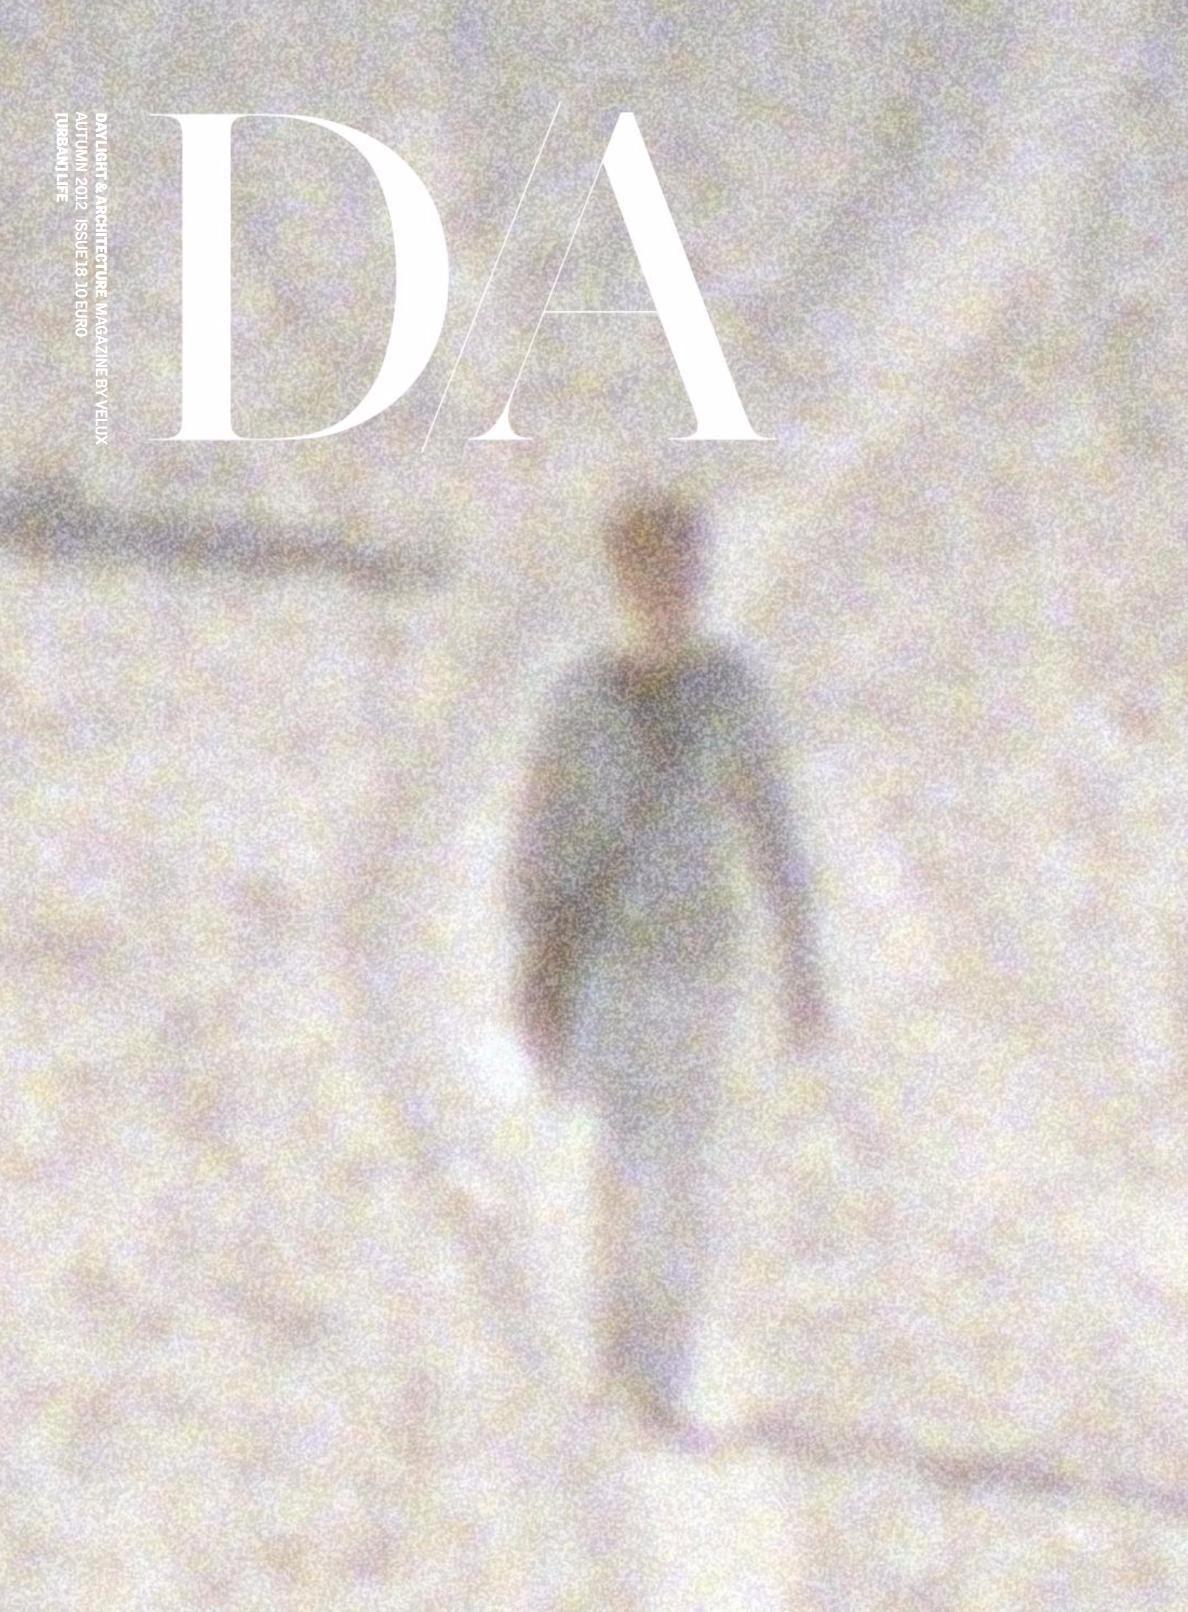 Daylight & Architecture Magazine, 2012, vol 8